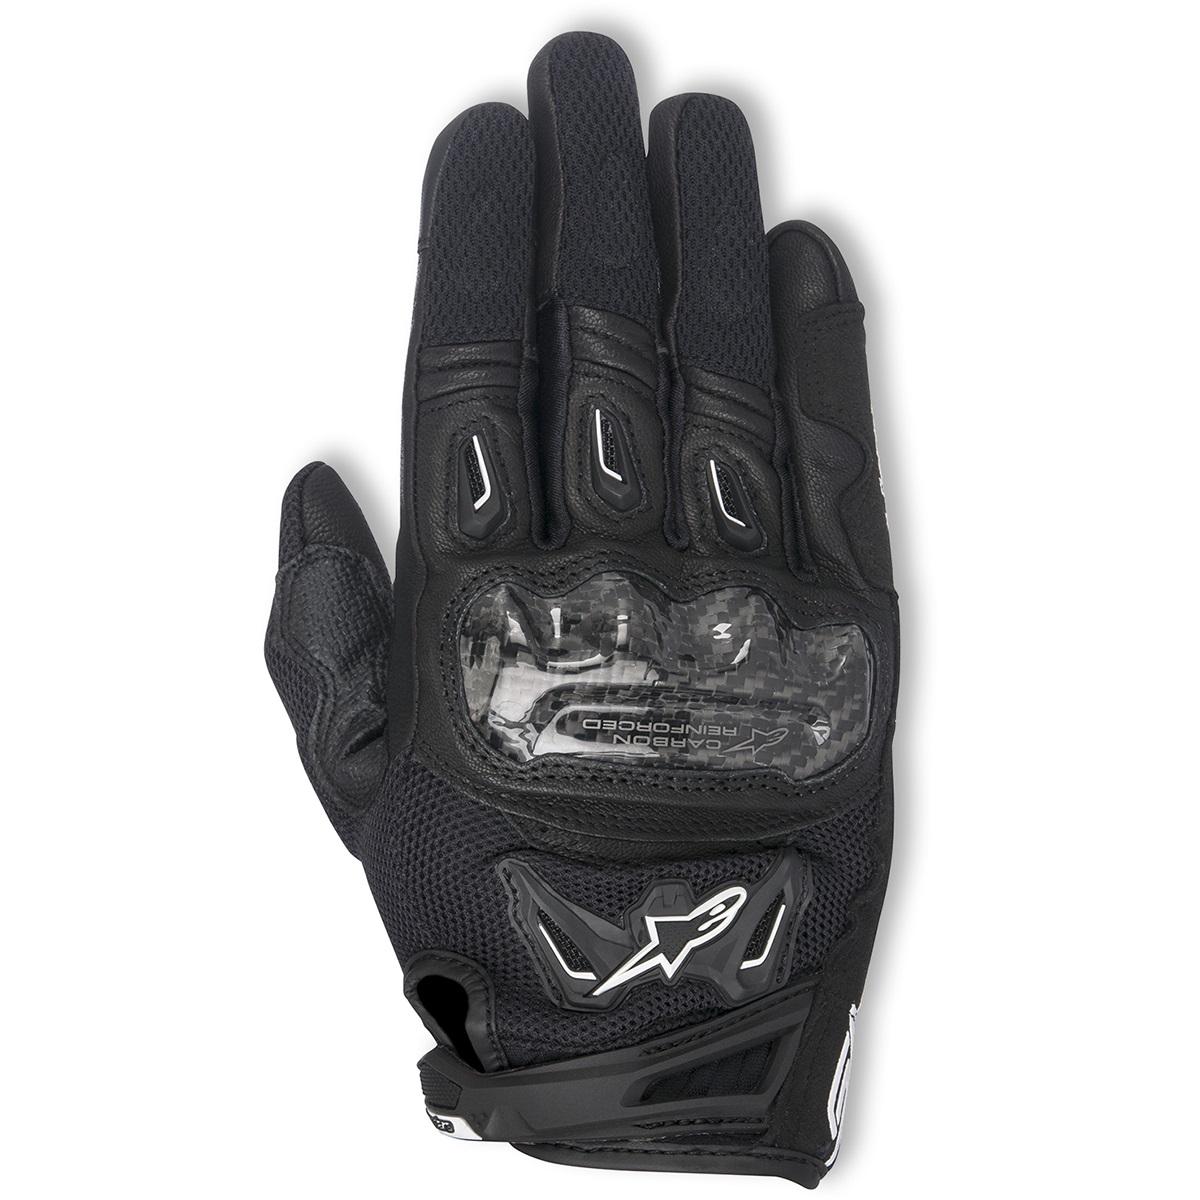 Alpinestars Women's SMX 2 Carbon Black Gloves